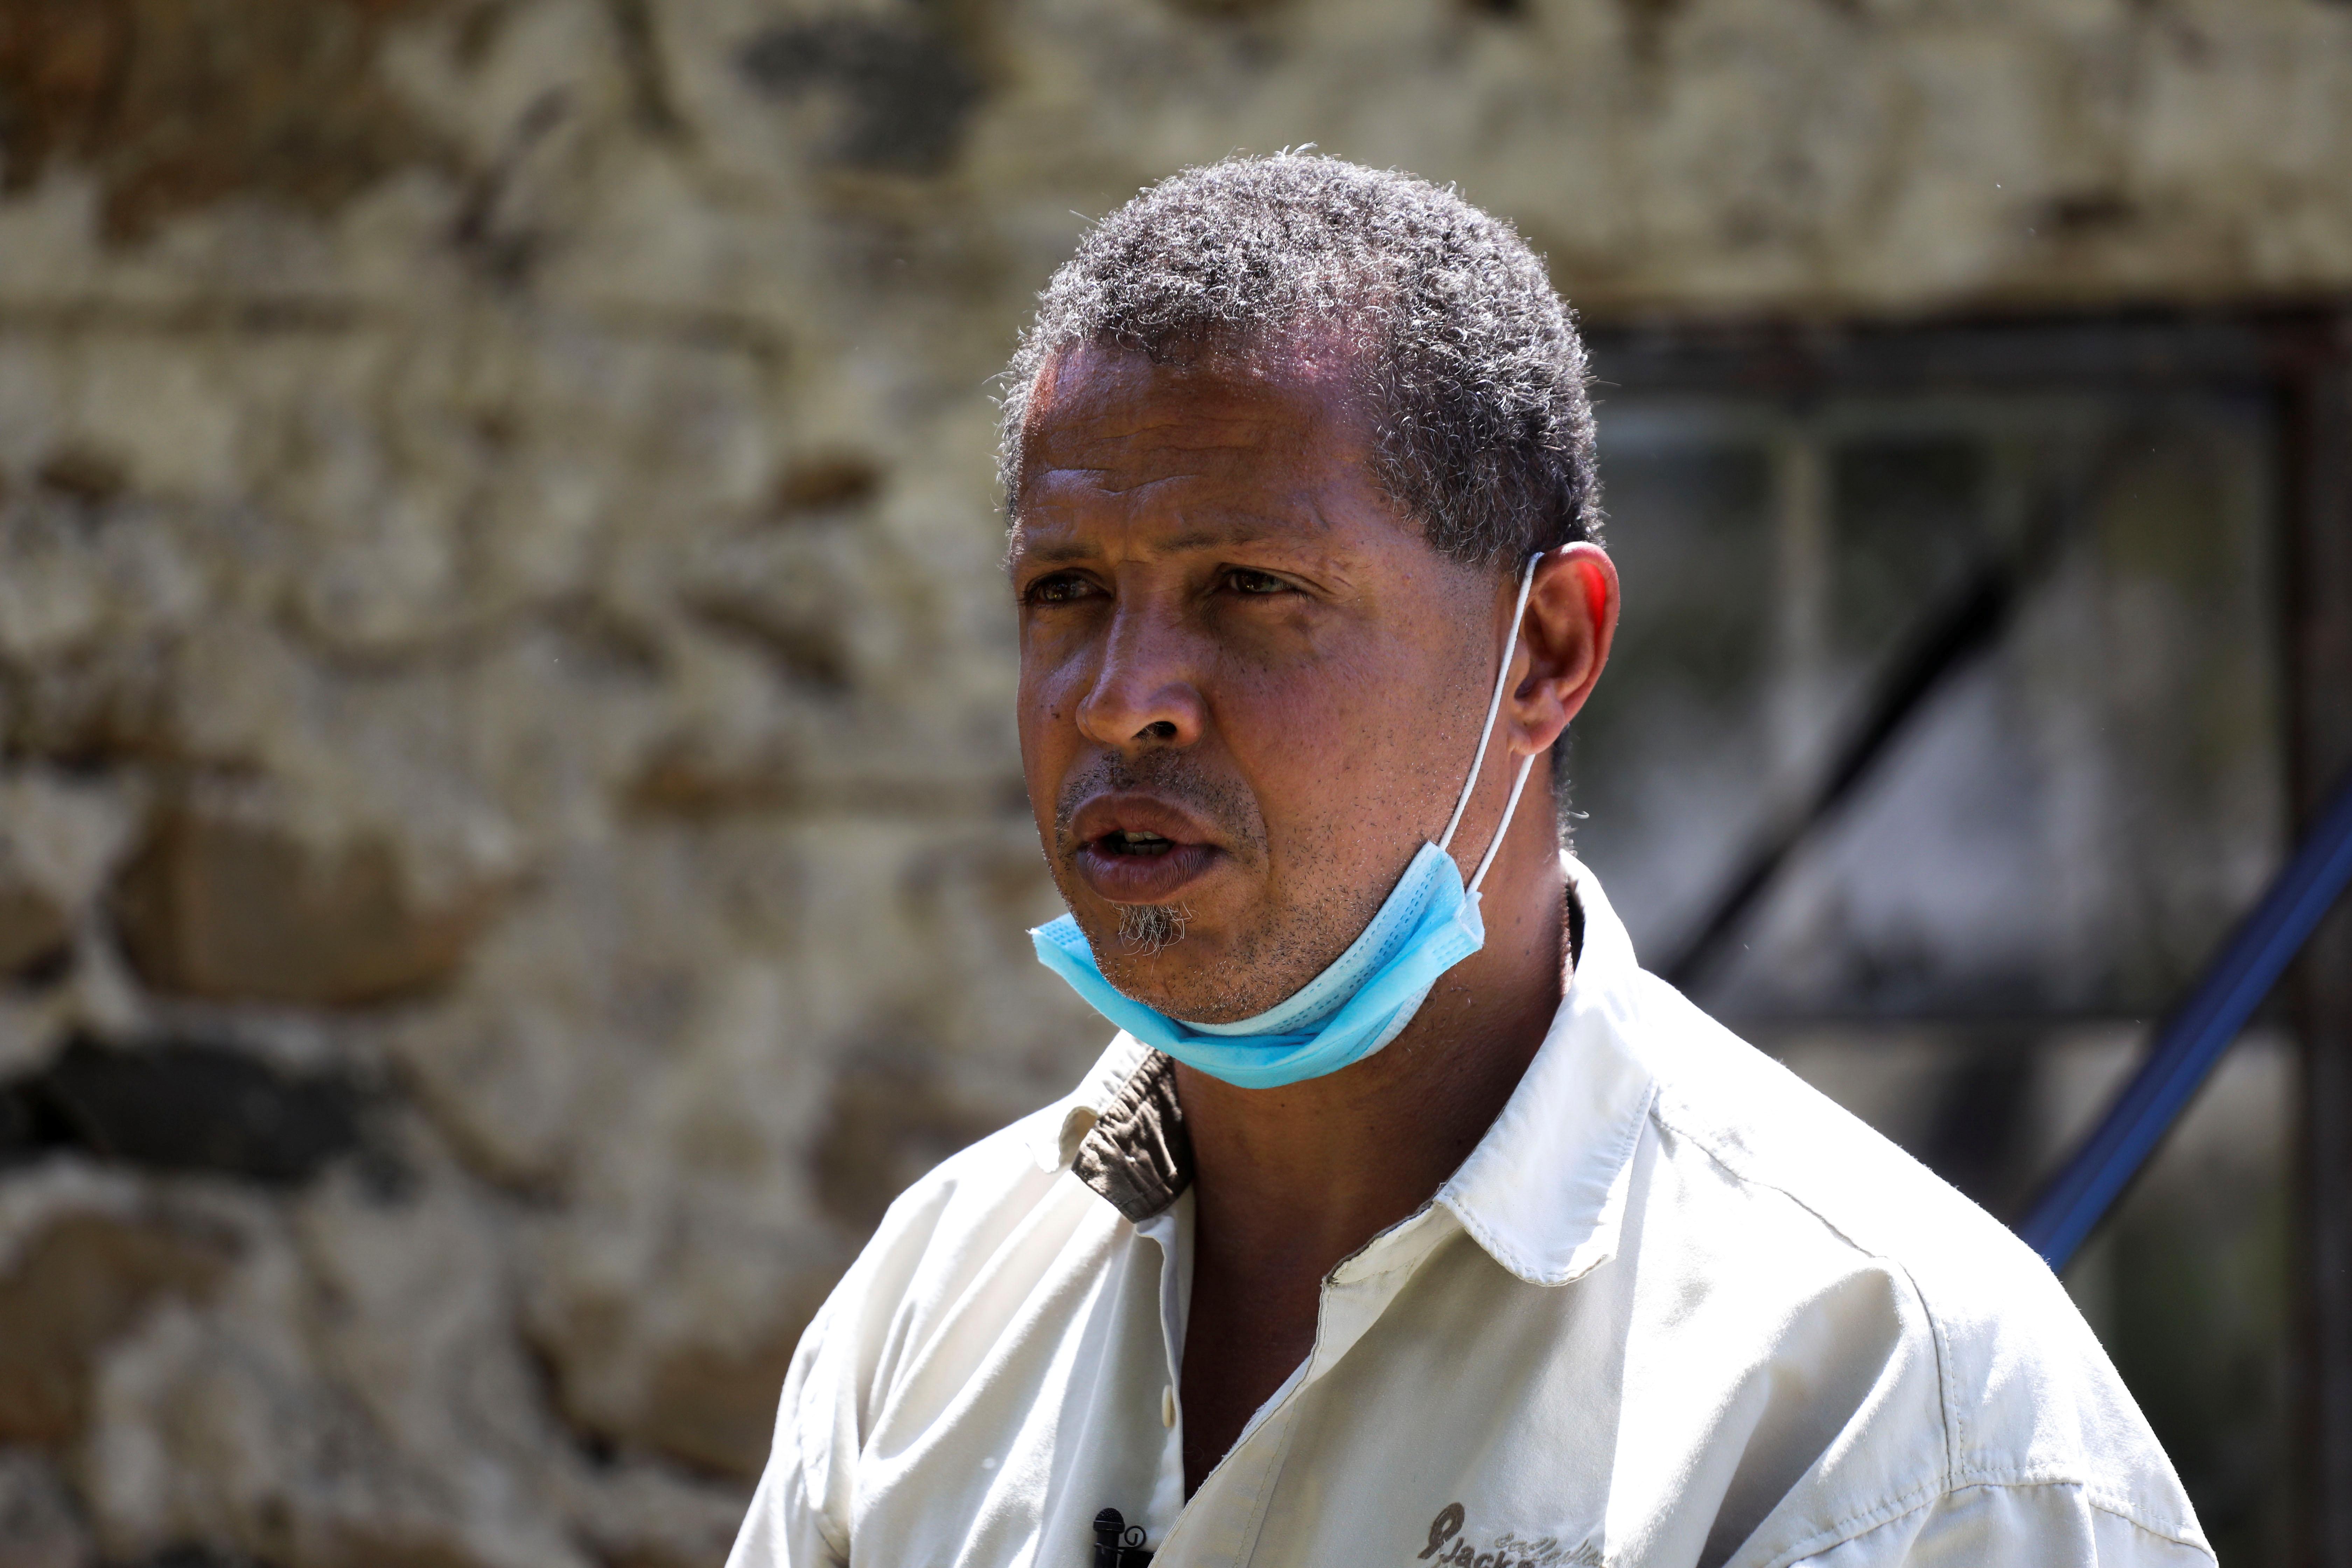 Entrepreneur Dominic Kahumbu speaks during an interview with Reuters, near the town of Kisumu, Kenya June 9, 2021. REUTERS/Baz Ratner